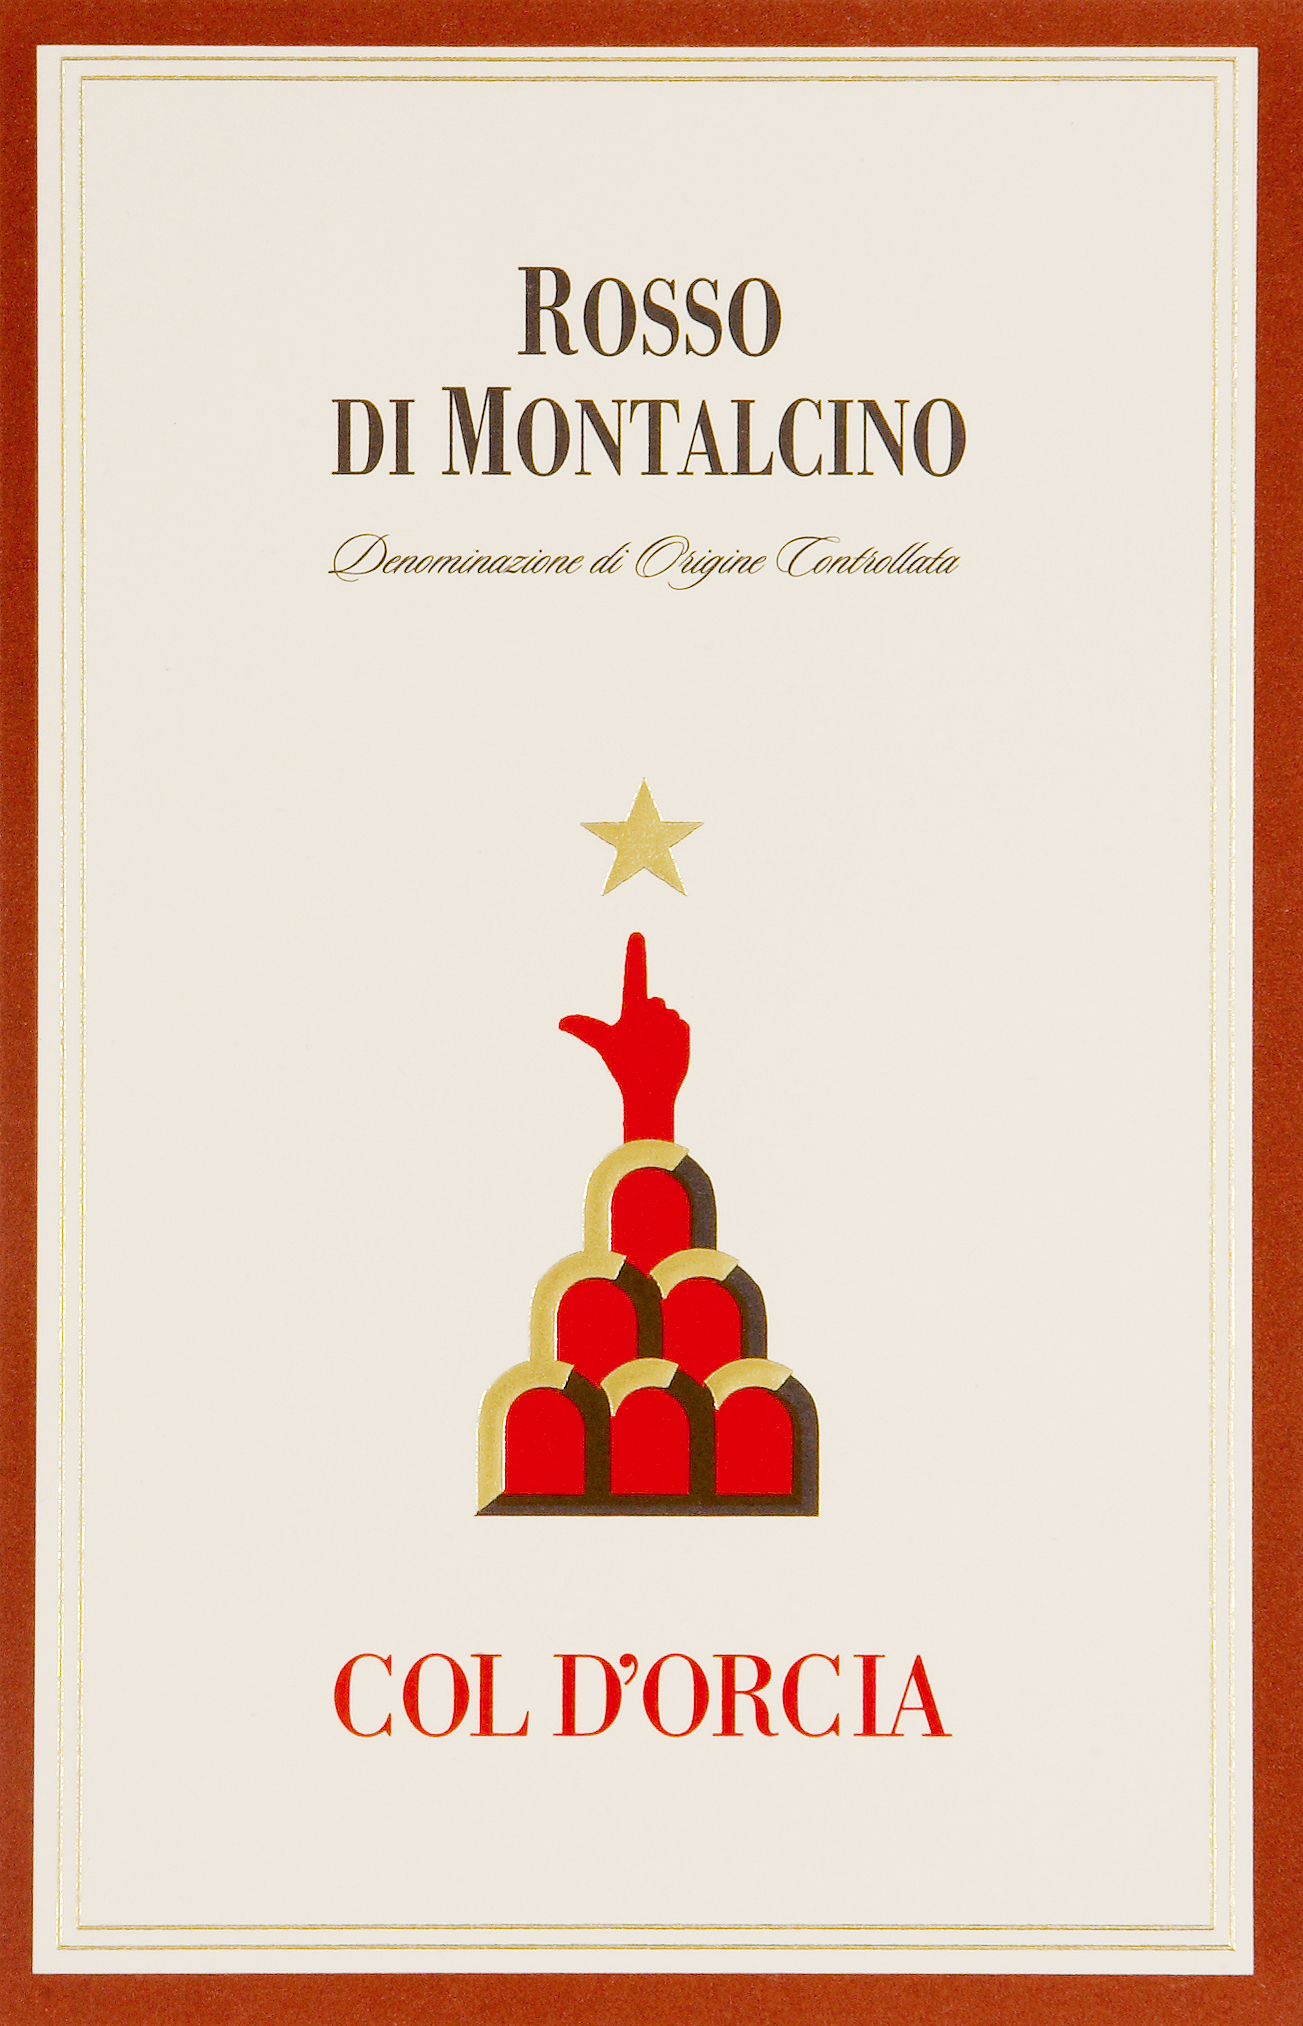 科尔多奇亚酒庄蒙帕塞诺干红Col D'Orcia Rosso di Montalcino